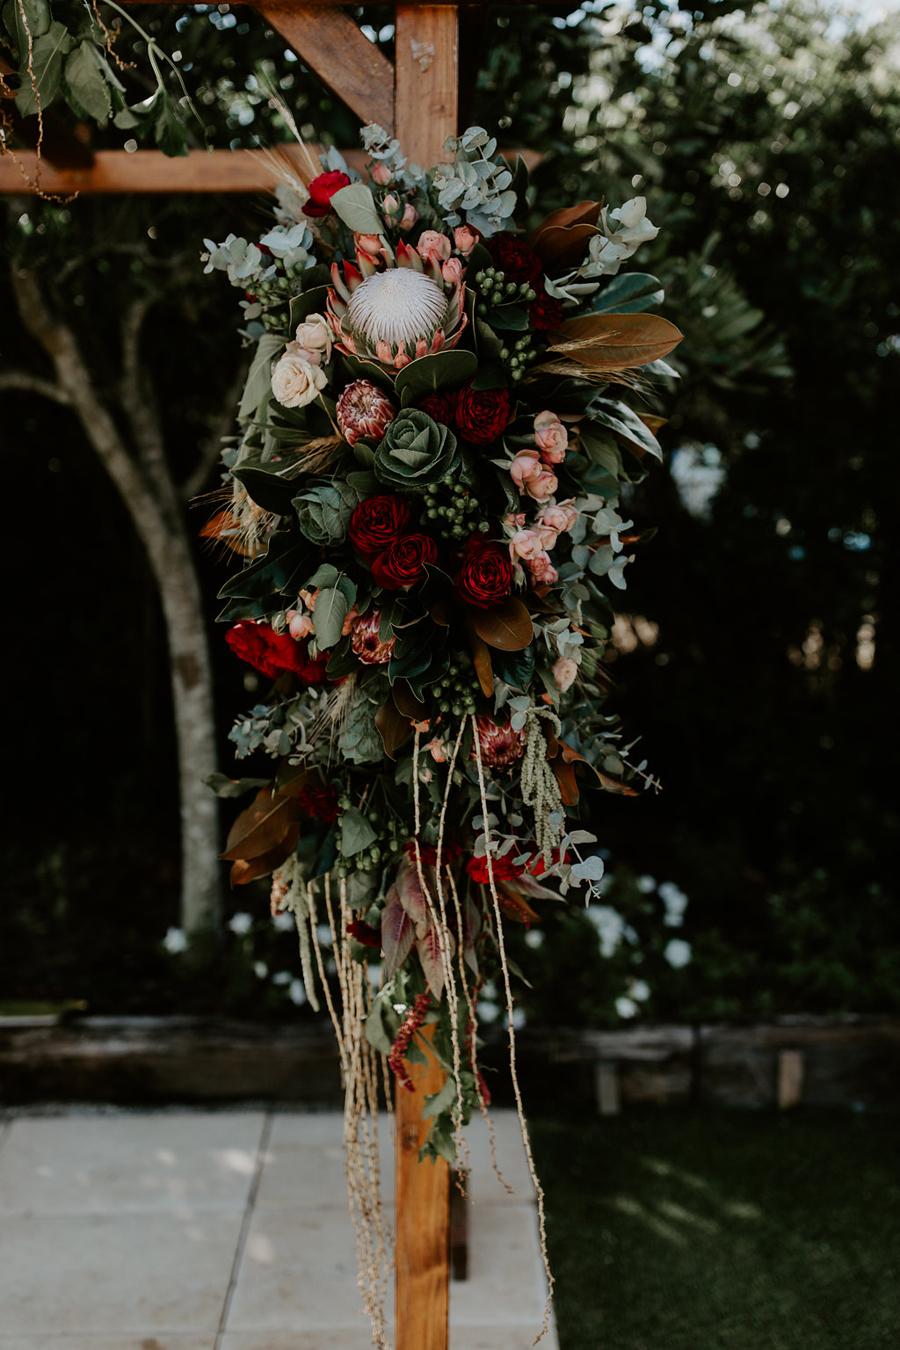 osteria-casuarina-wedding-venue-tweed-coast-weddings-coastal-garden-reception-real-wedding011.jpg